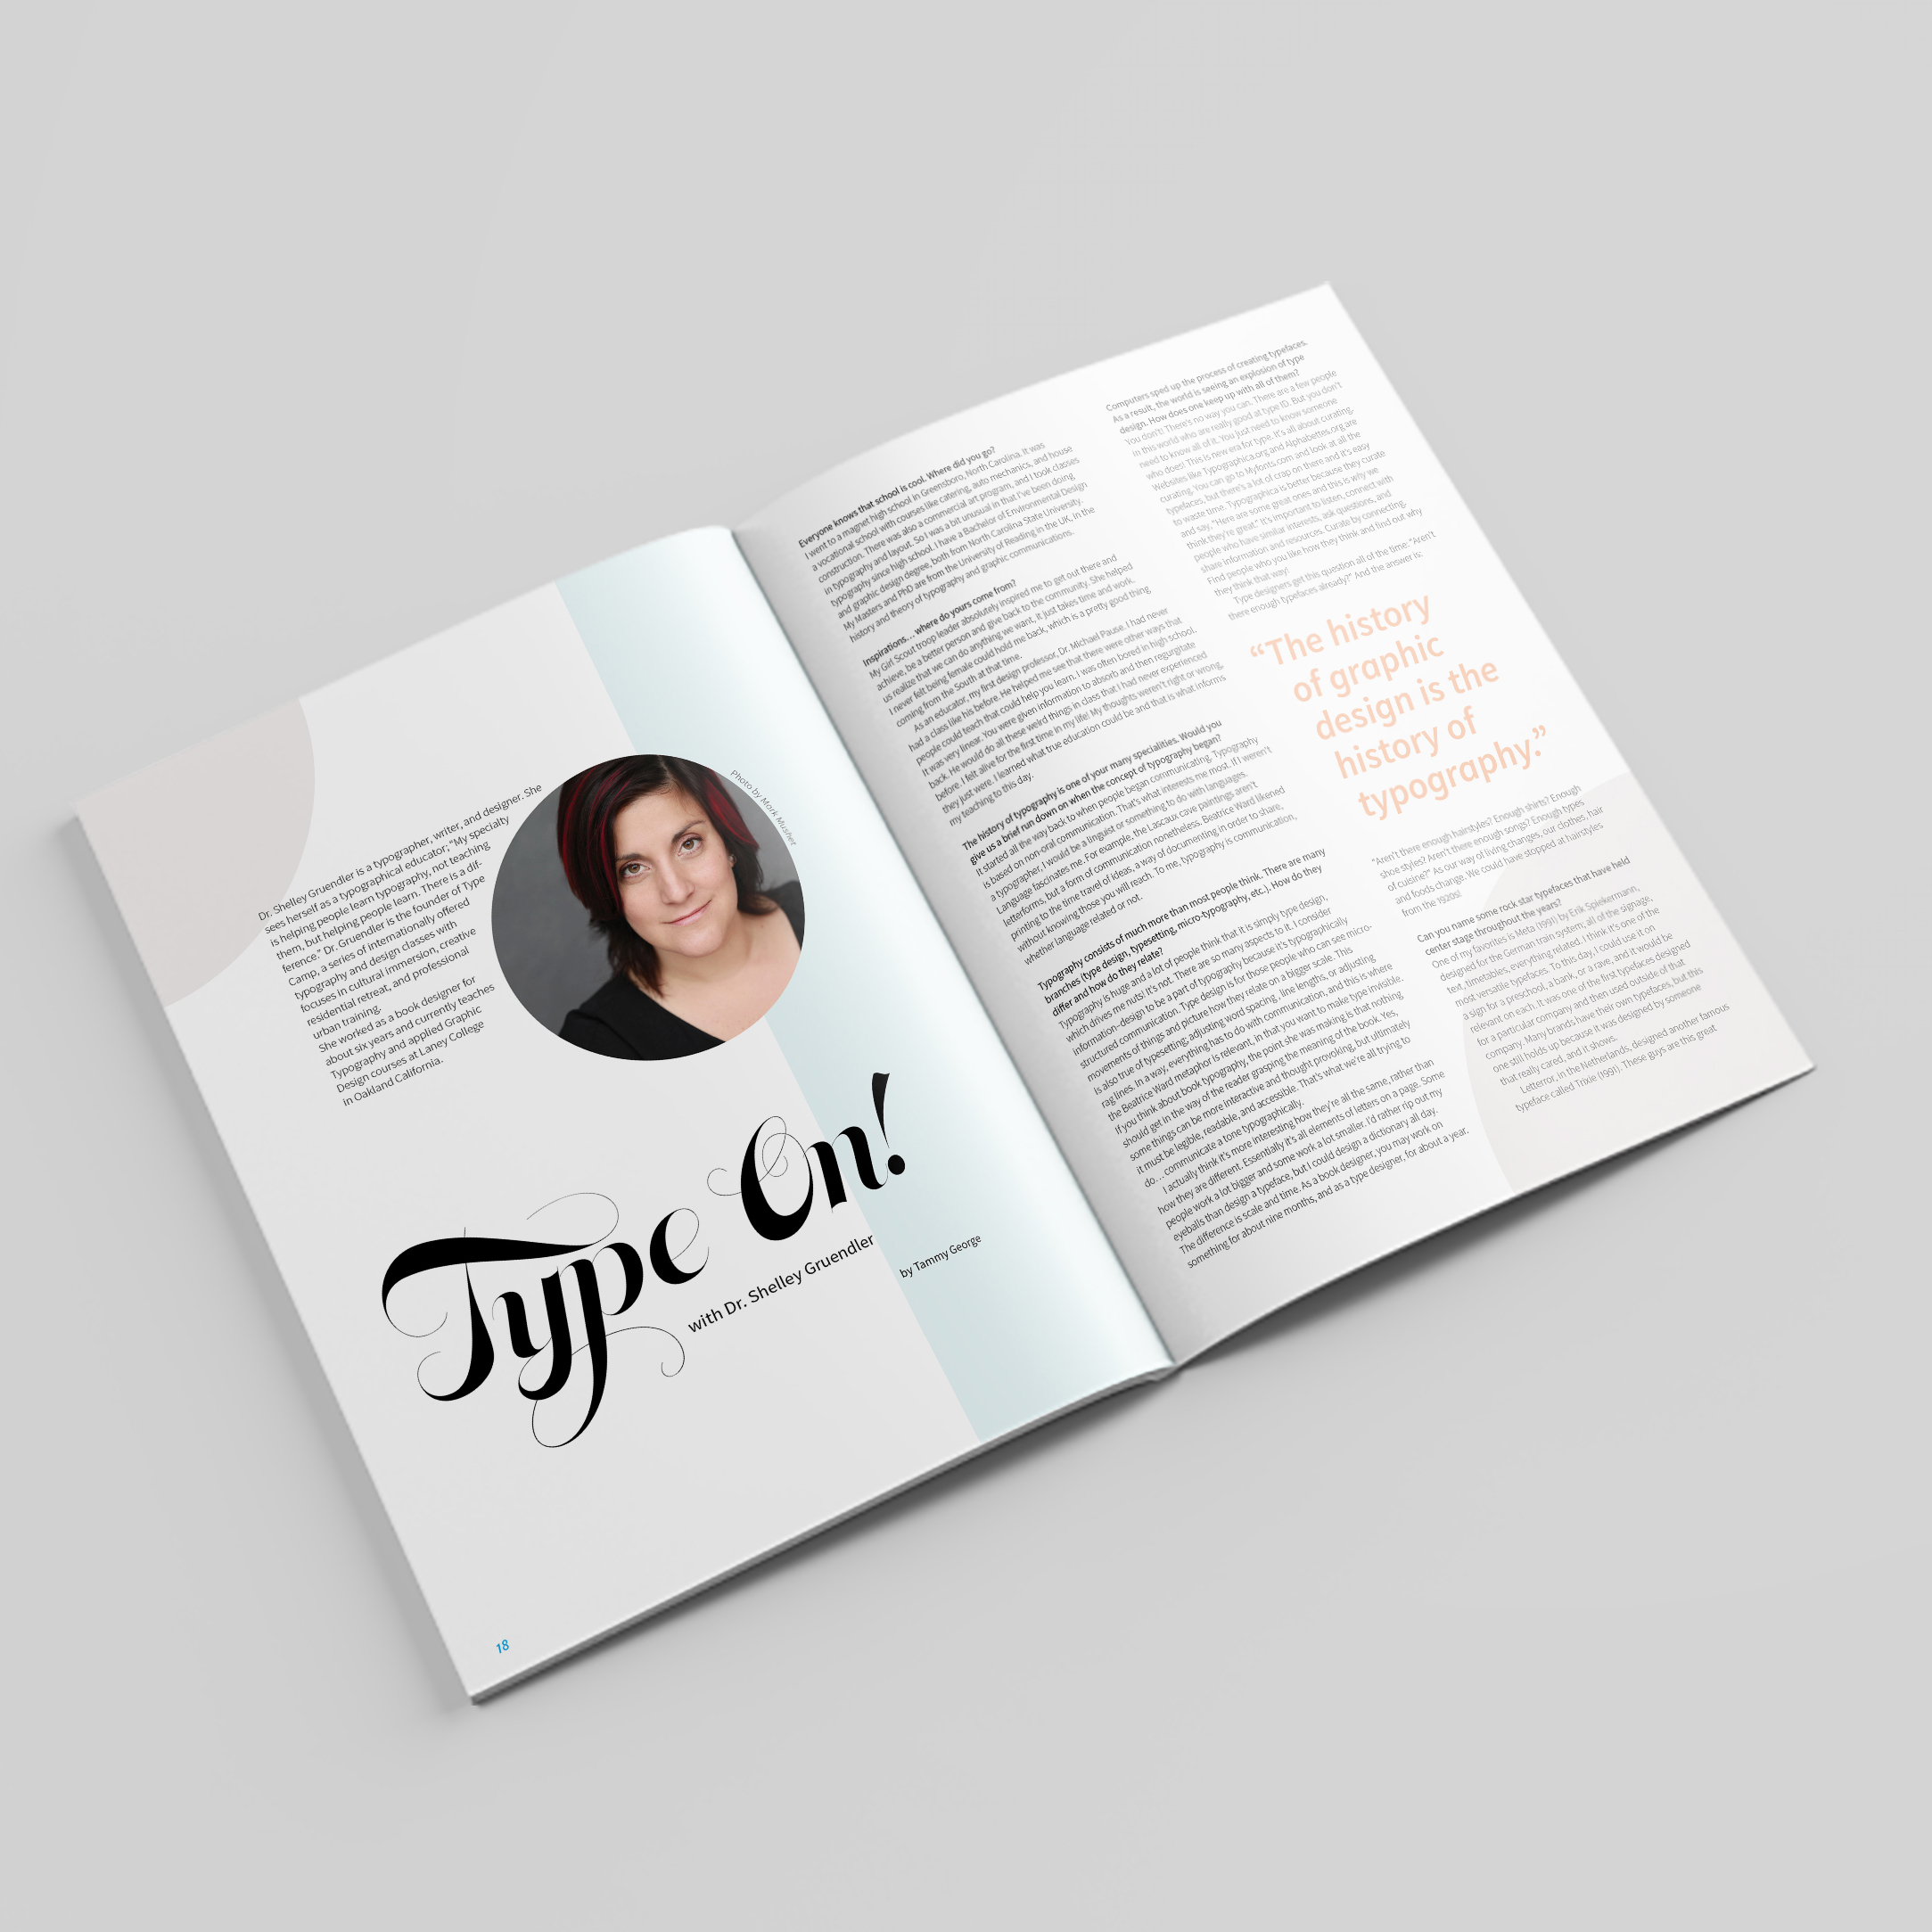 magazine pages typesetting illustration